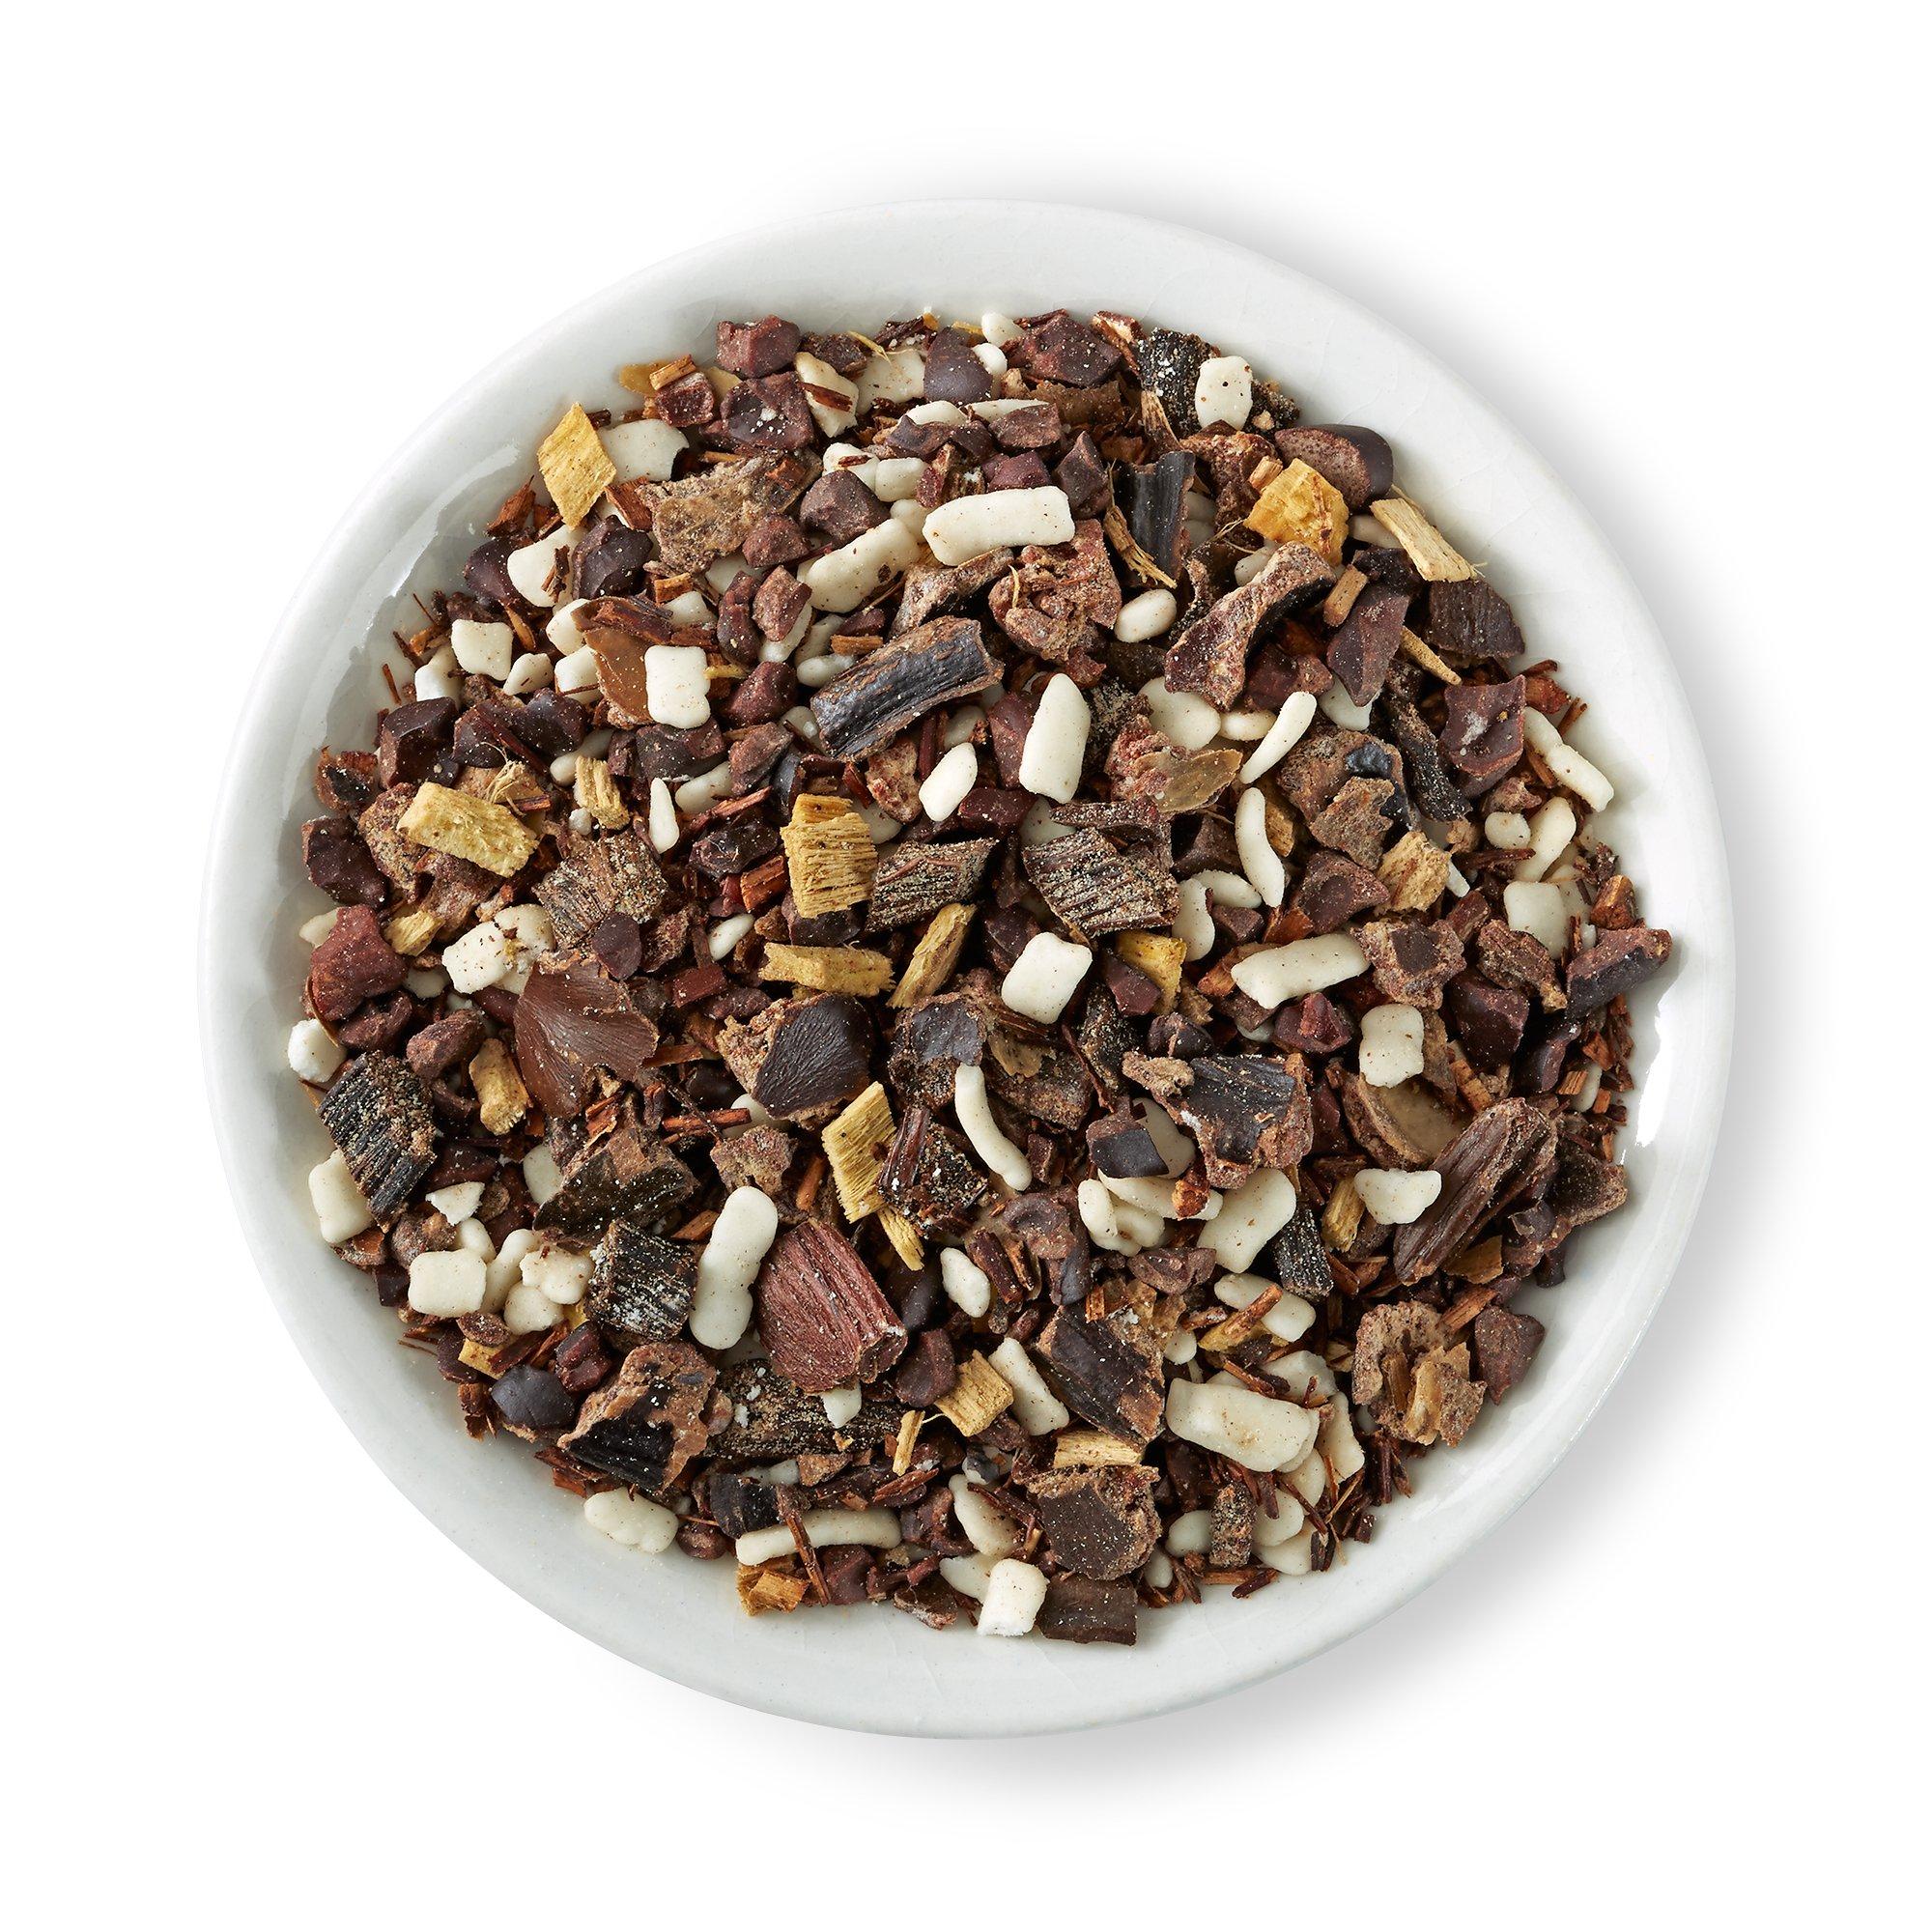 White Chocolate Peppermint Rooibos Tea by Teavana by Teavana